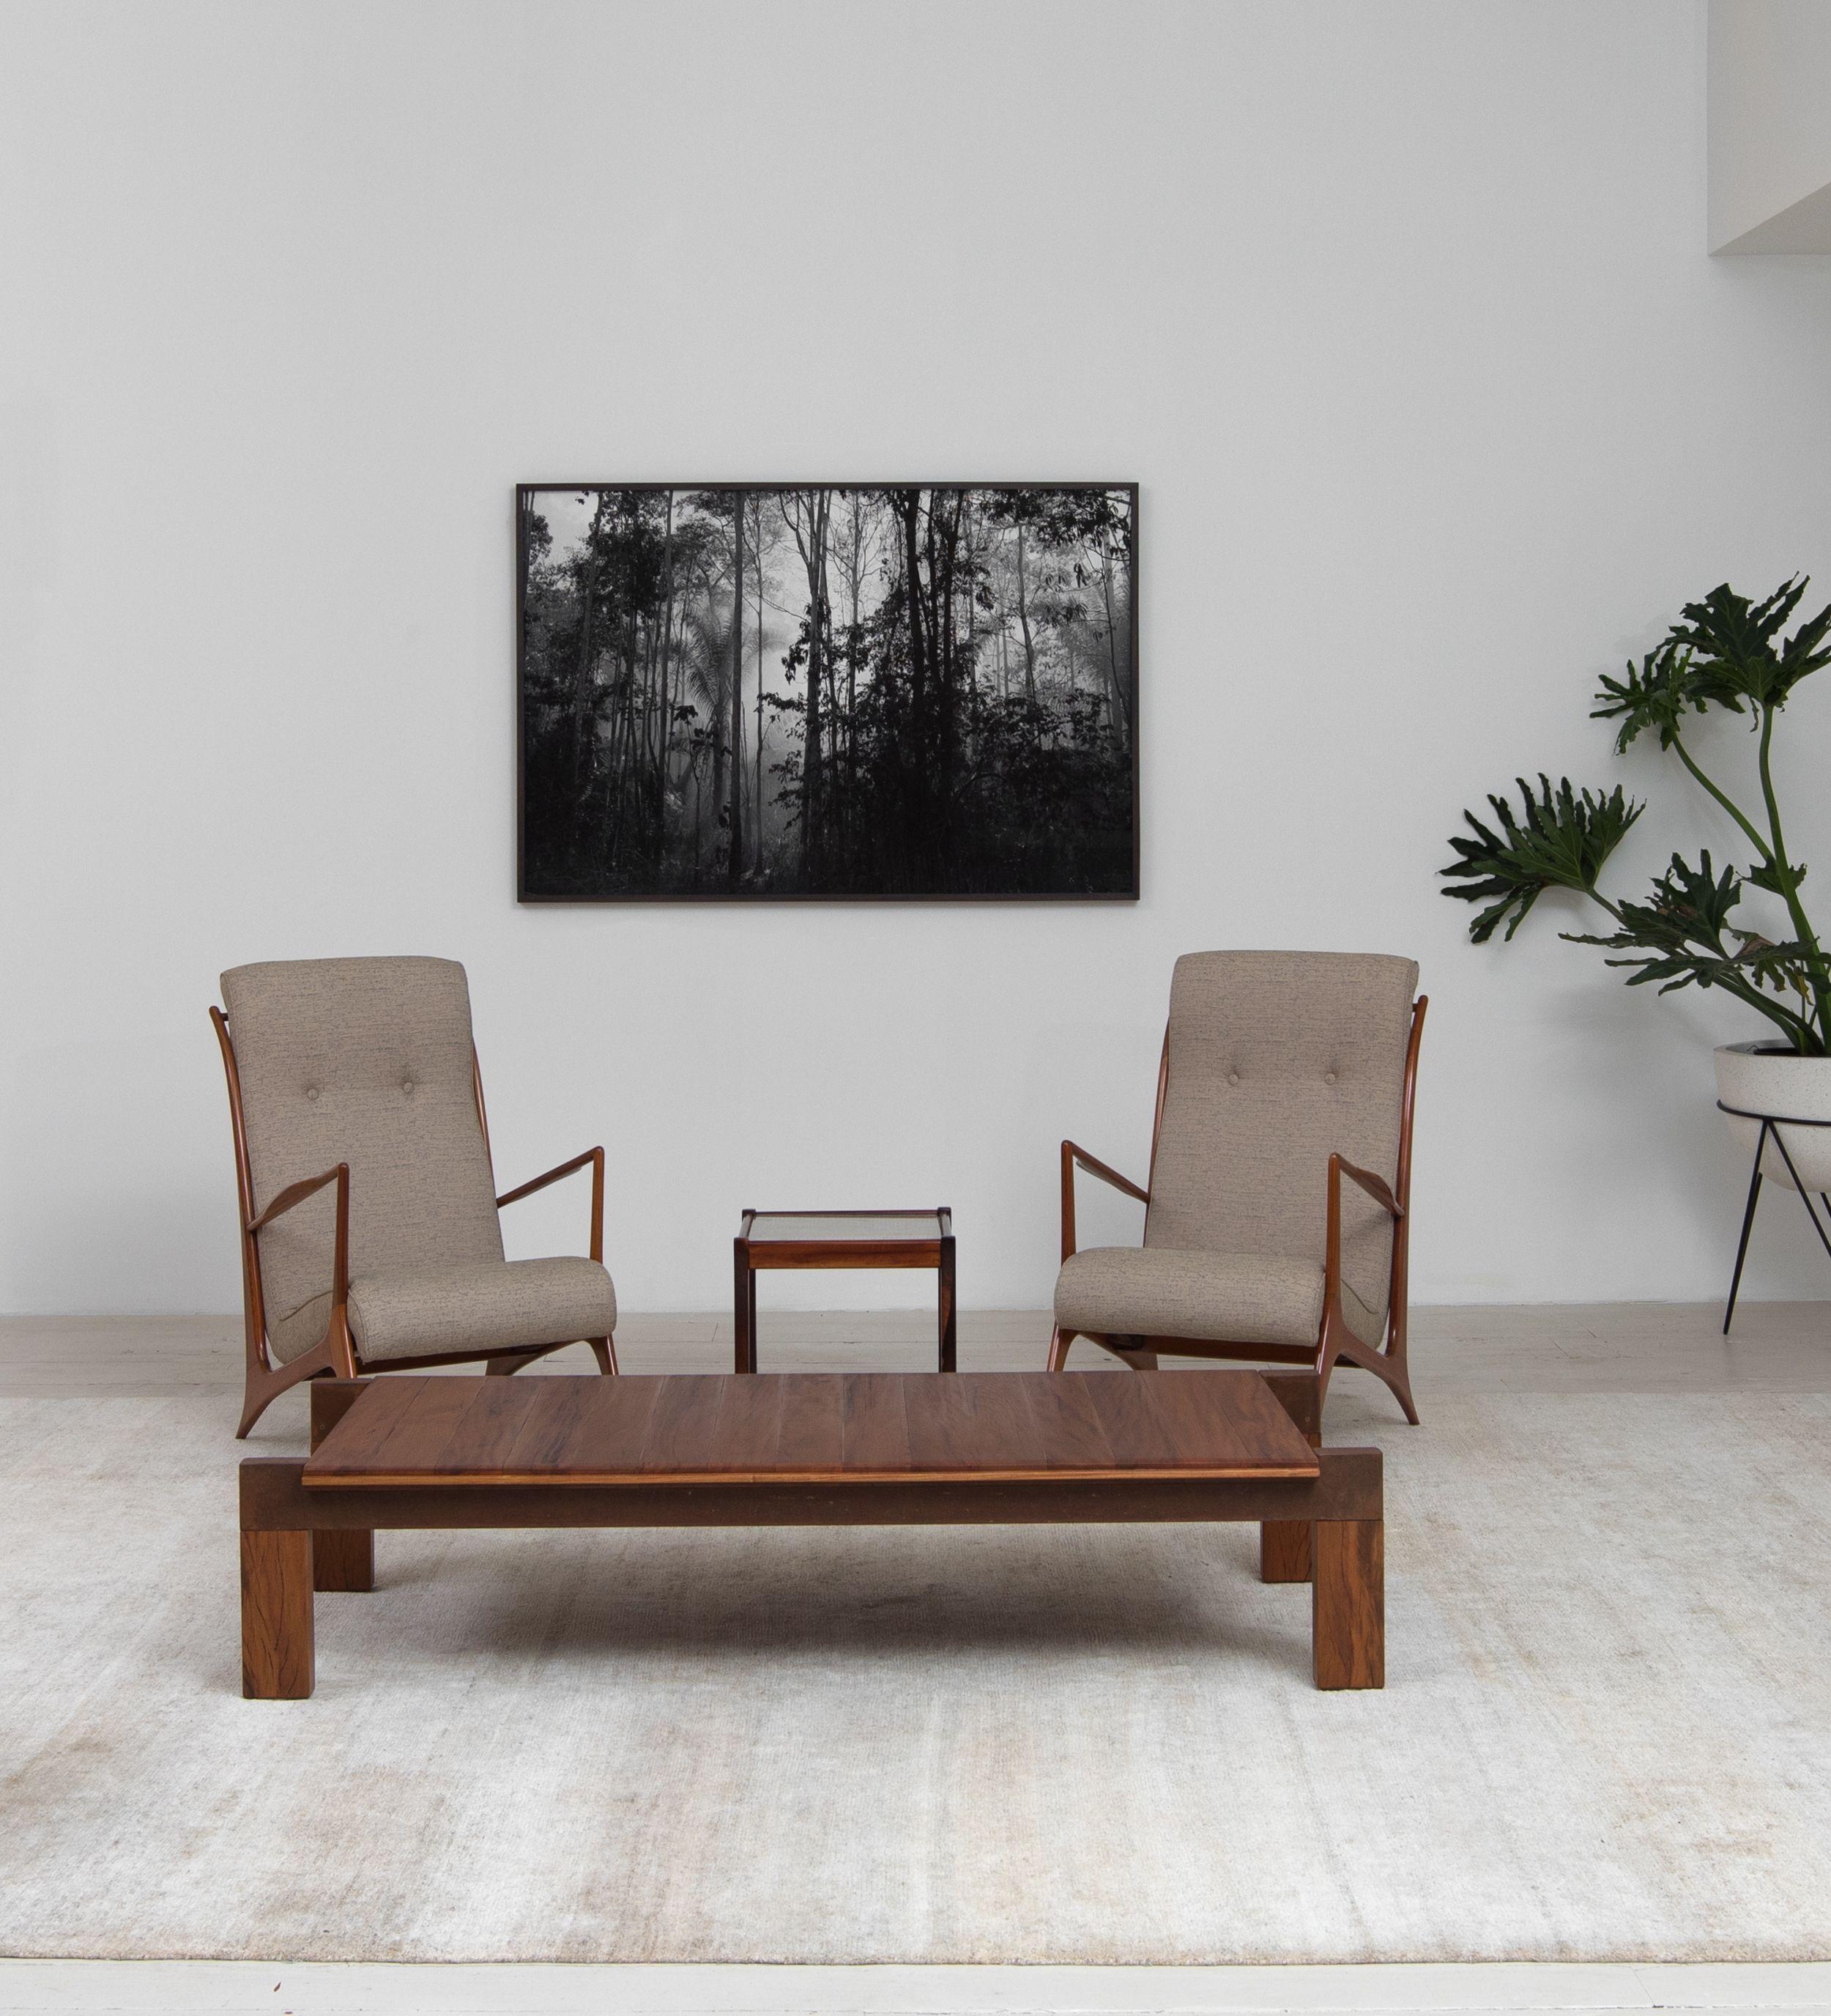 Vintage John Graz armchairs and CJ1 coffee table by Carlos